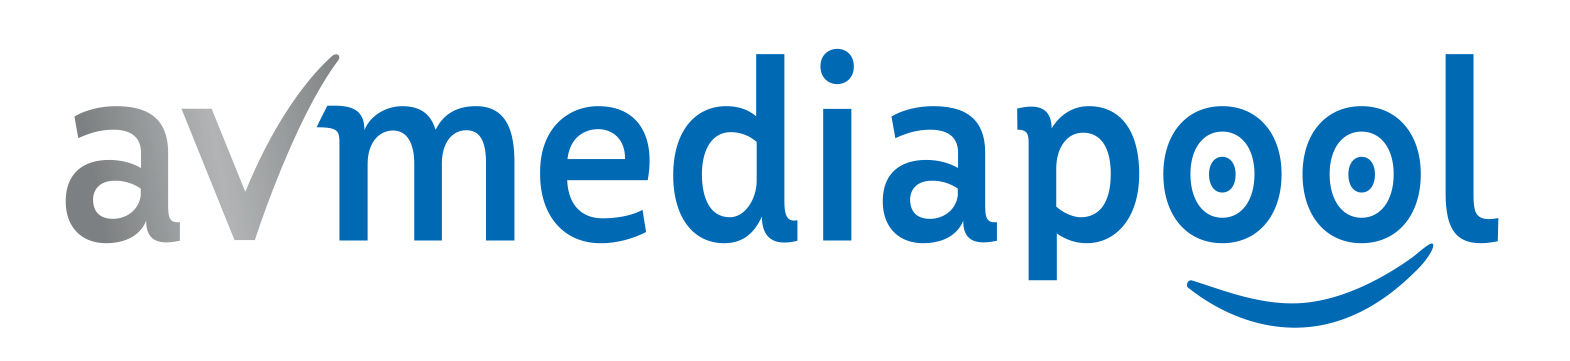 Farbmischung Logo